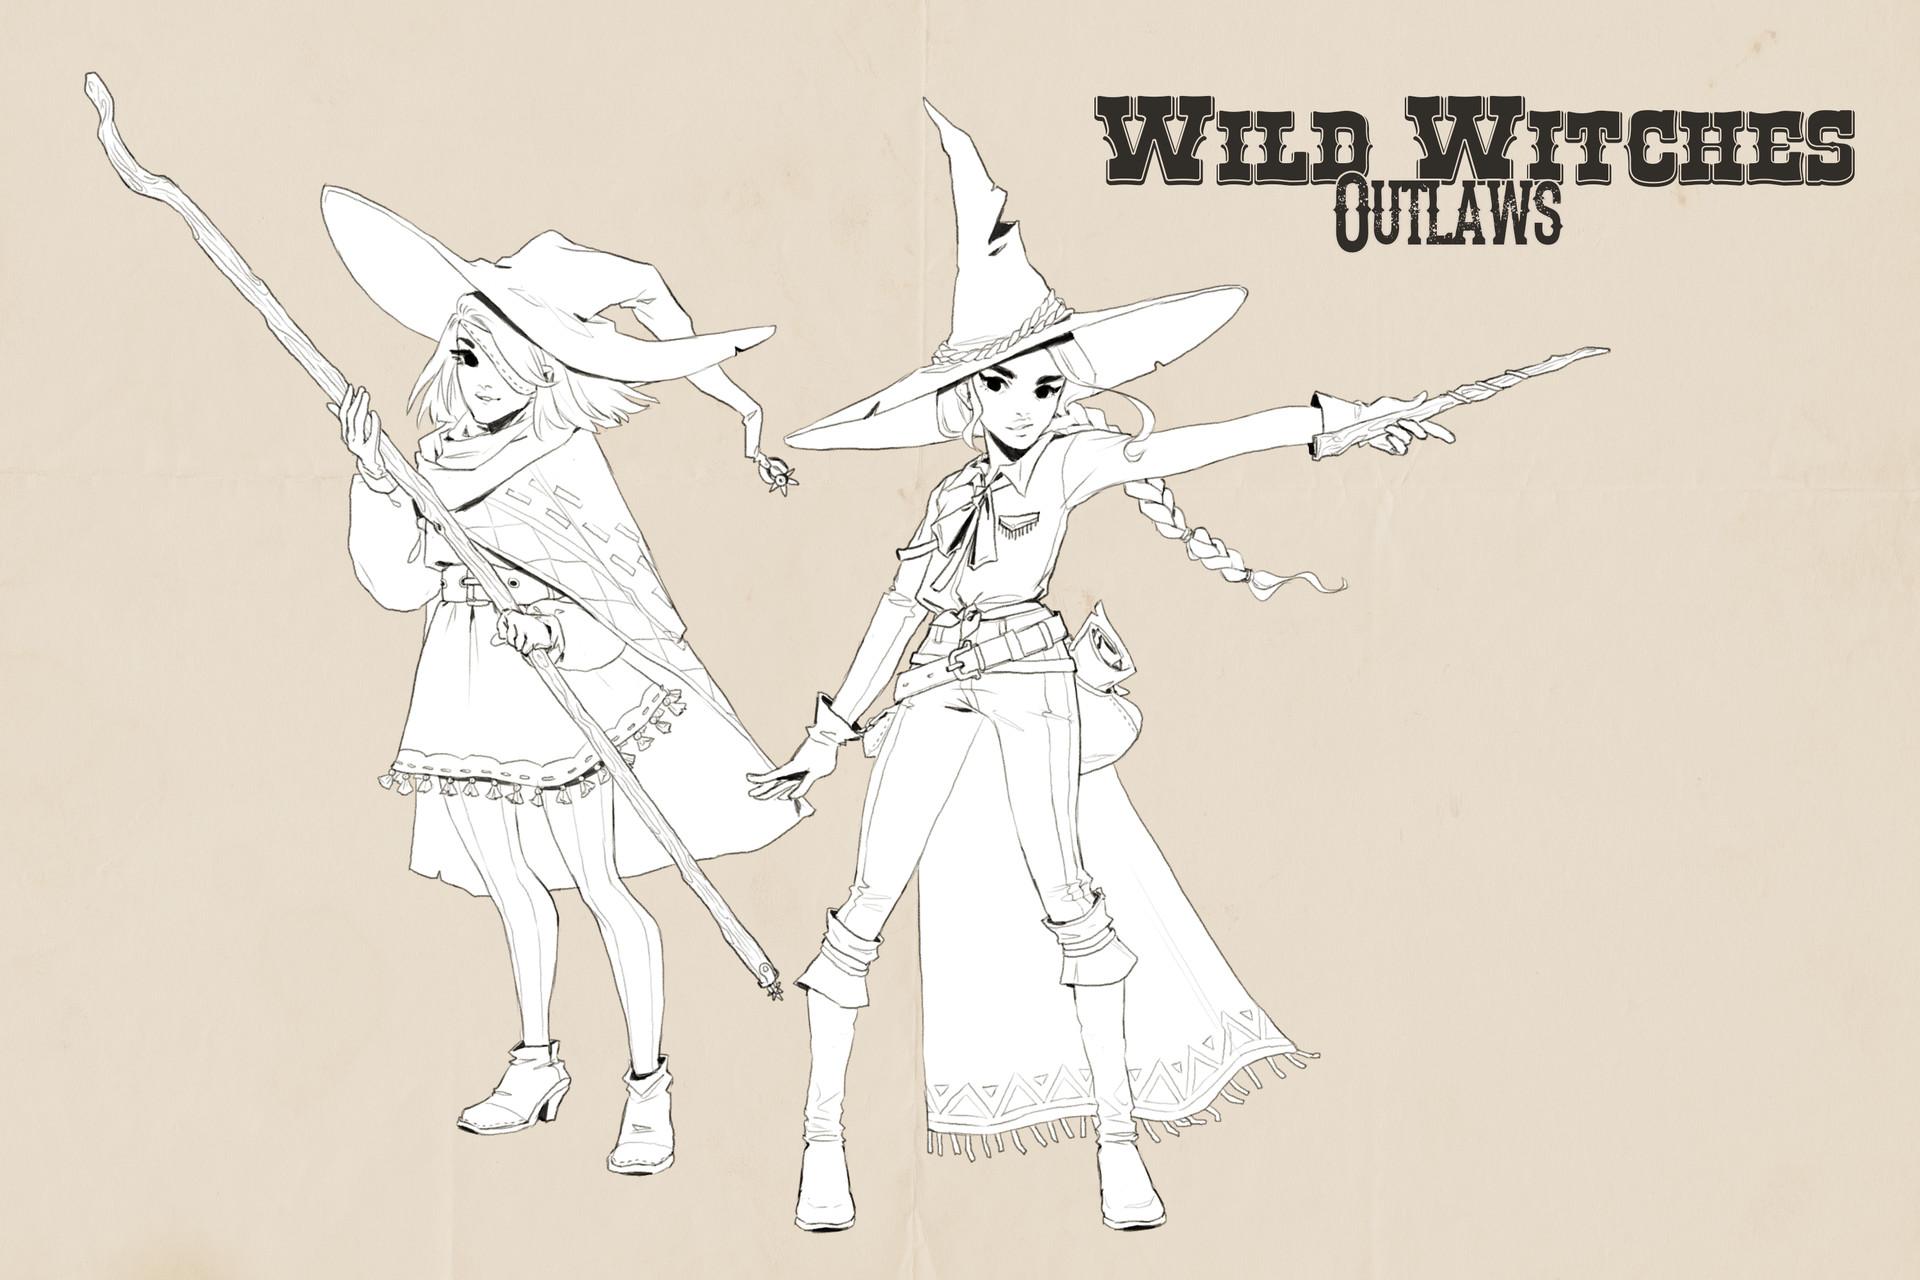 Dani kruse aswildwest outlaws lineart